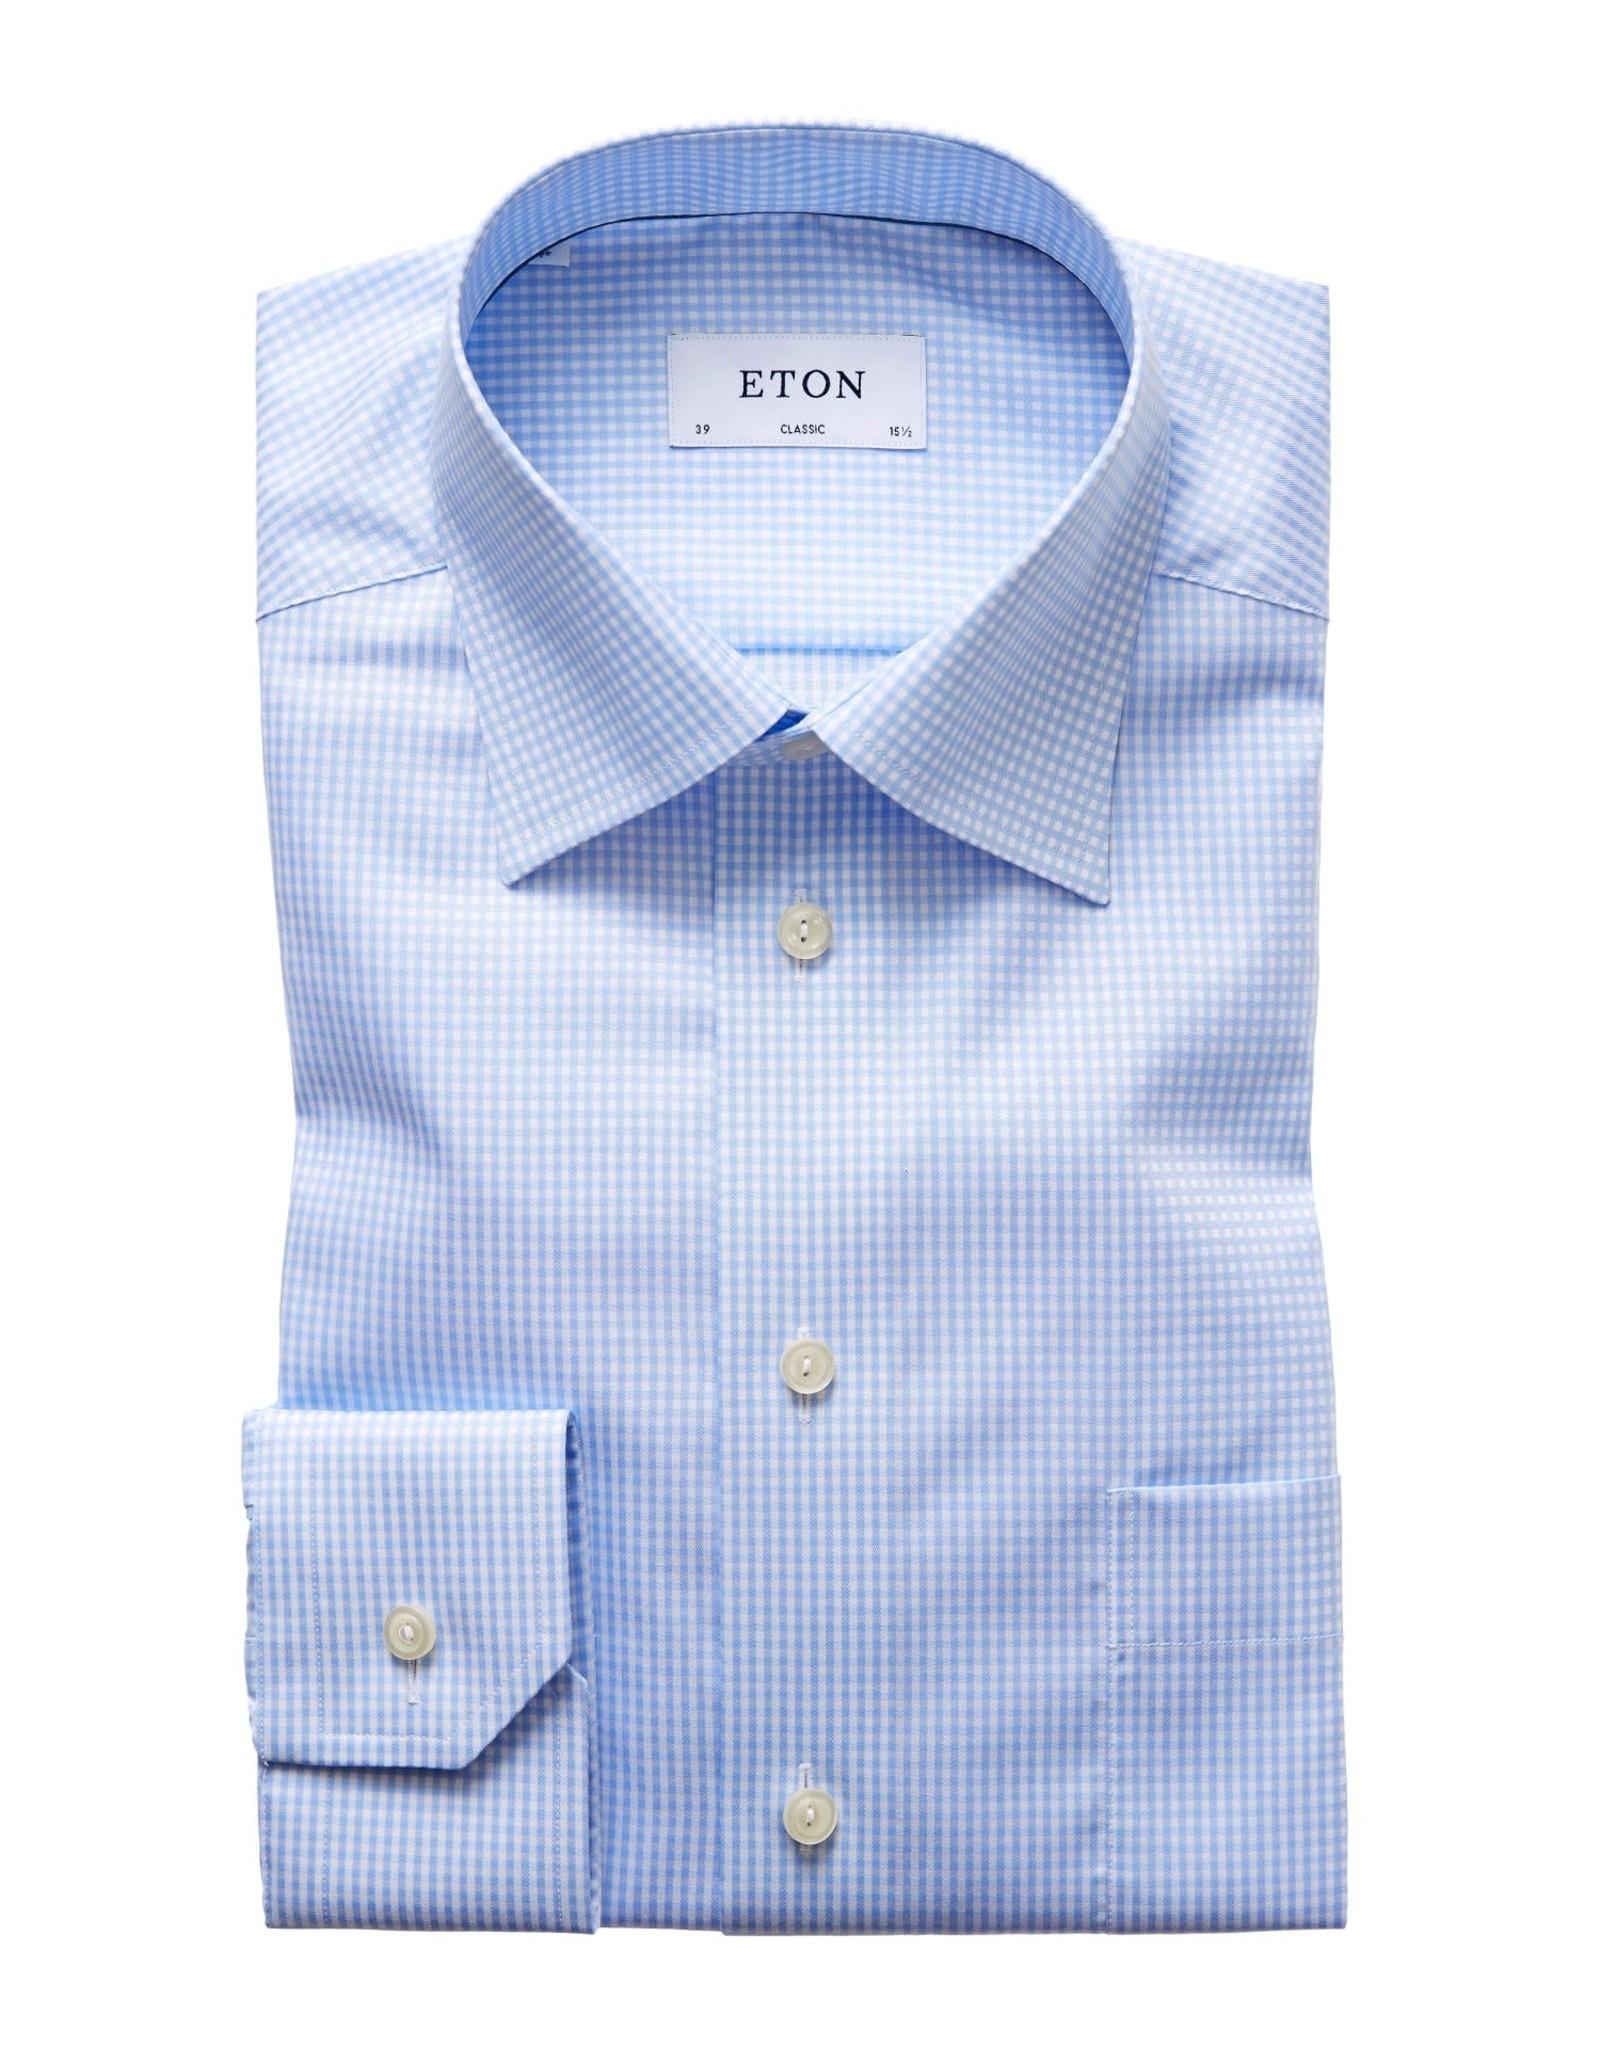 Eton Eton hemd blauw classic 7670-78011/21